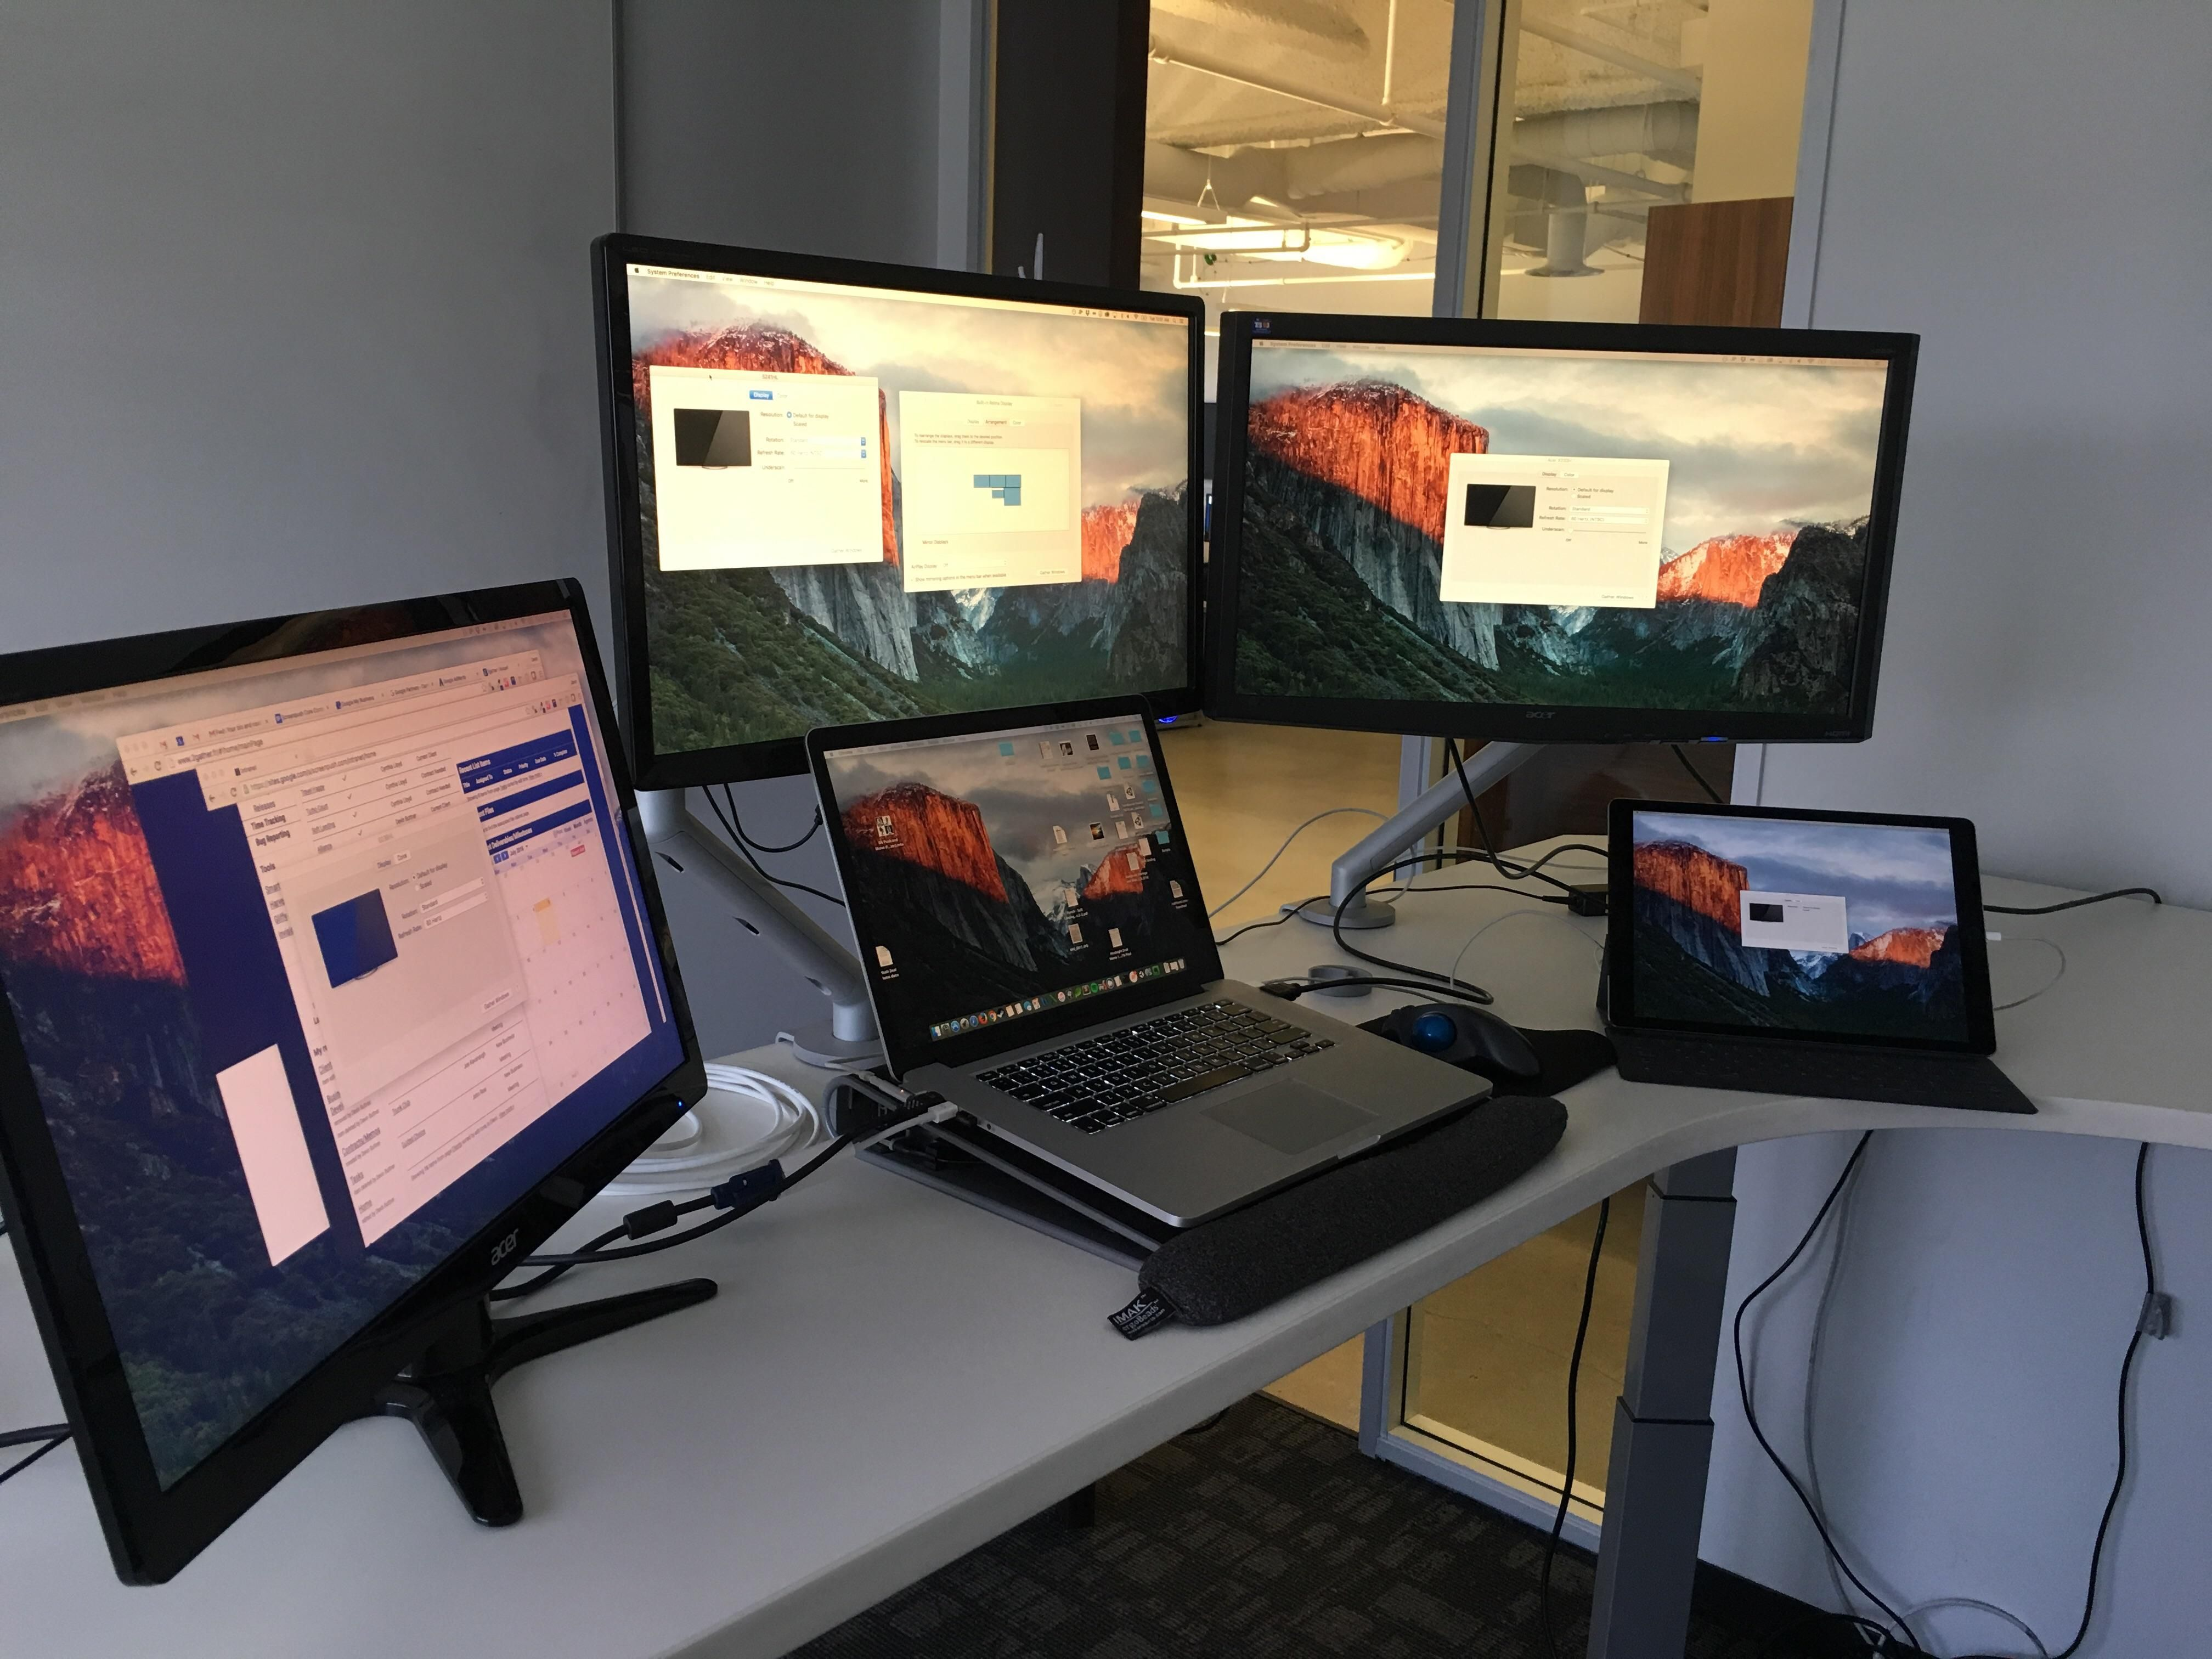 My Ultimate Standing Desk Setup They Say Additional Screens Increase Productivity Desk Setup Setup Desk